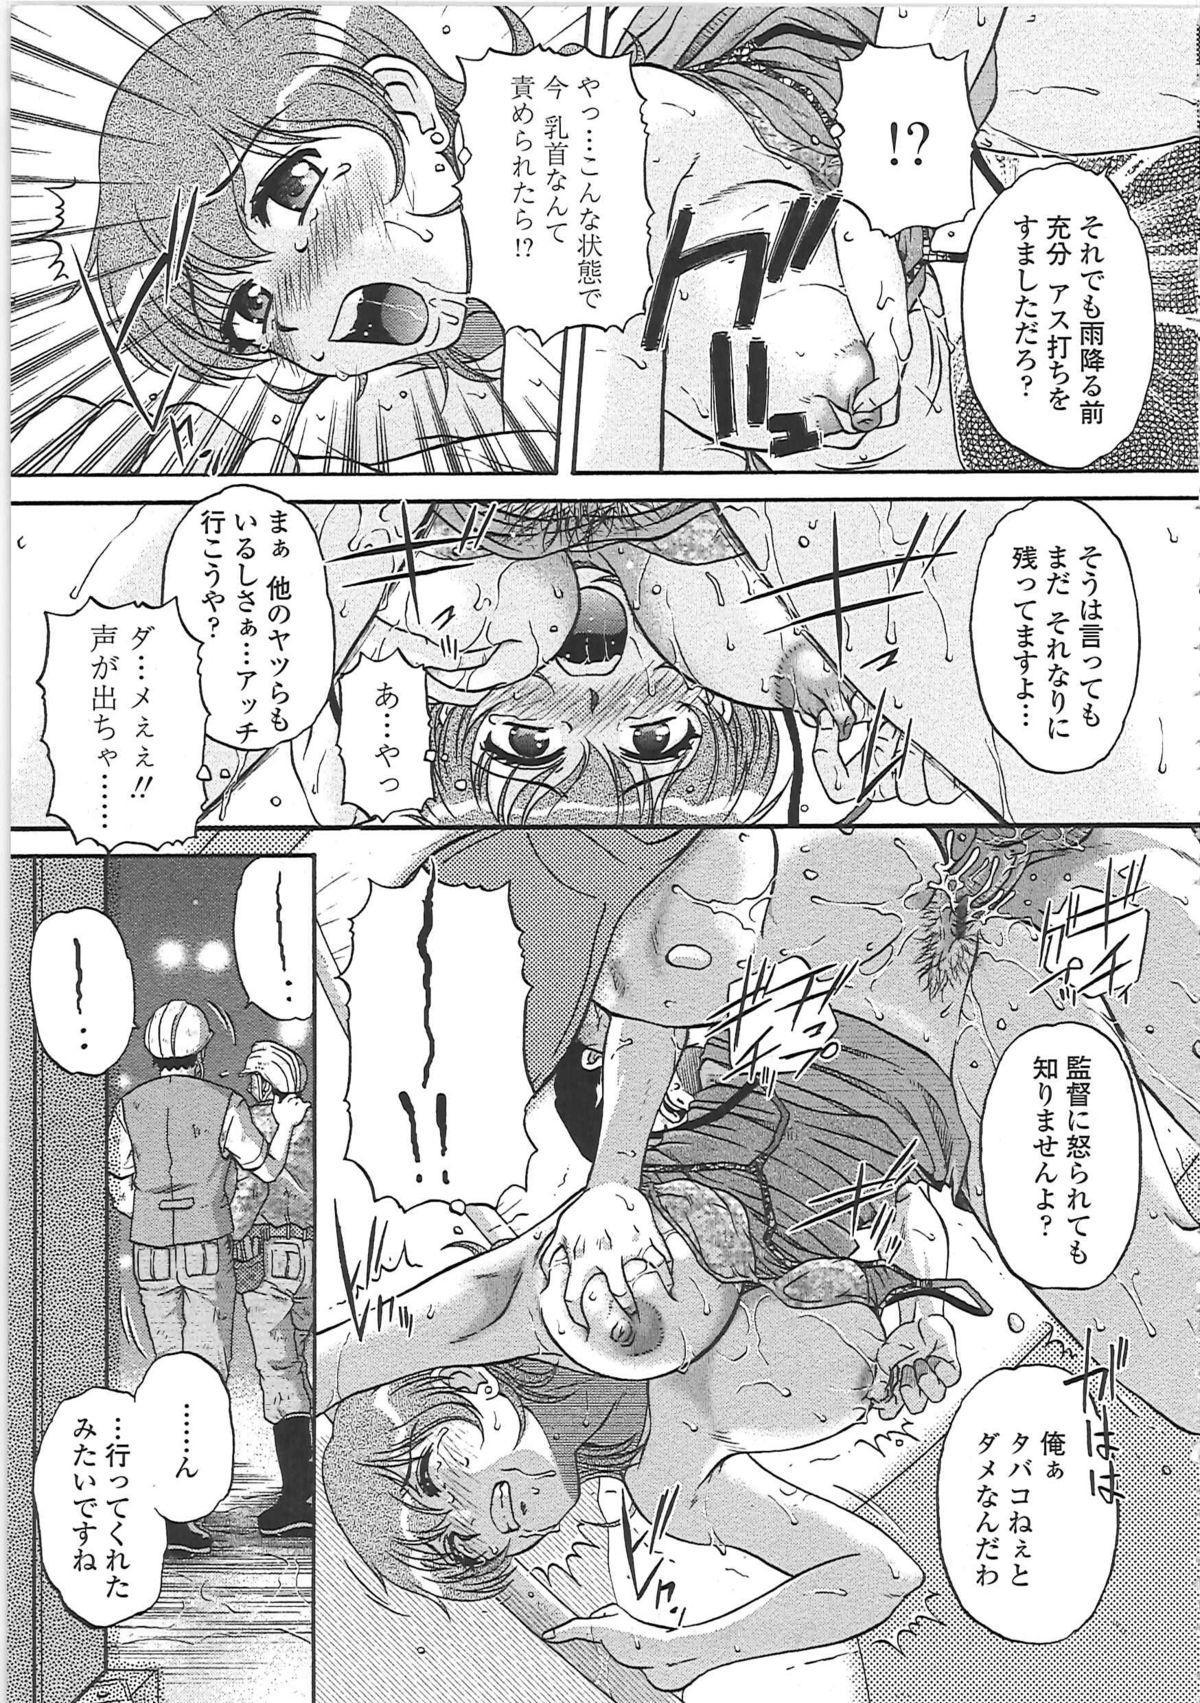 Nikuzuma Tsuushin - Erotic Wife Communication 159